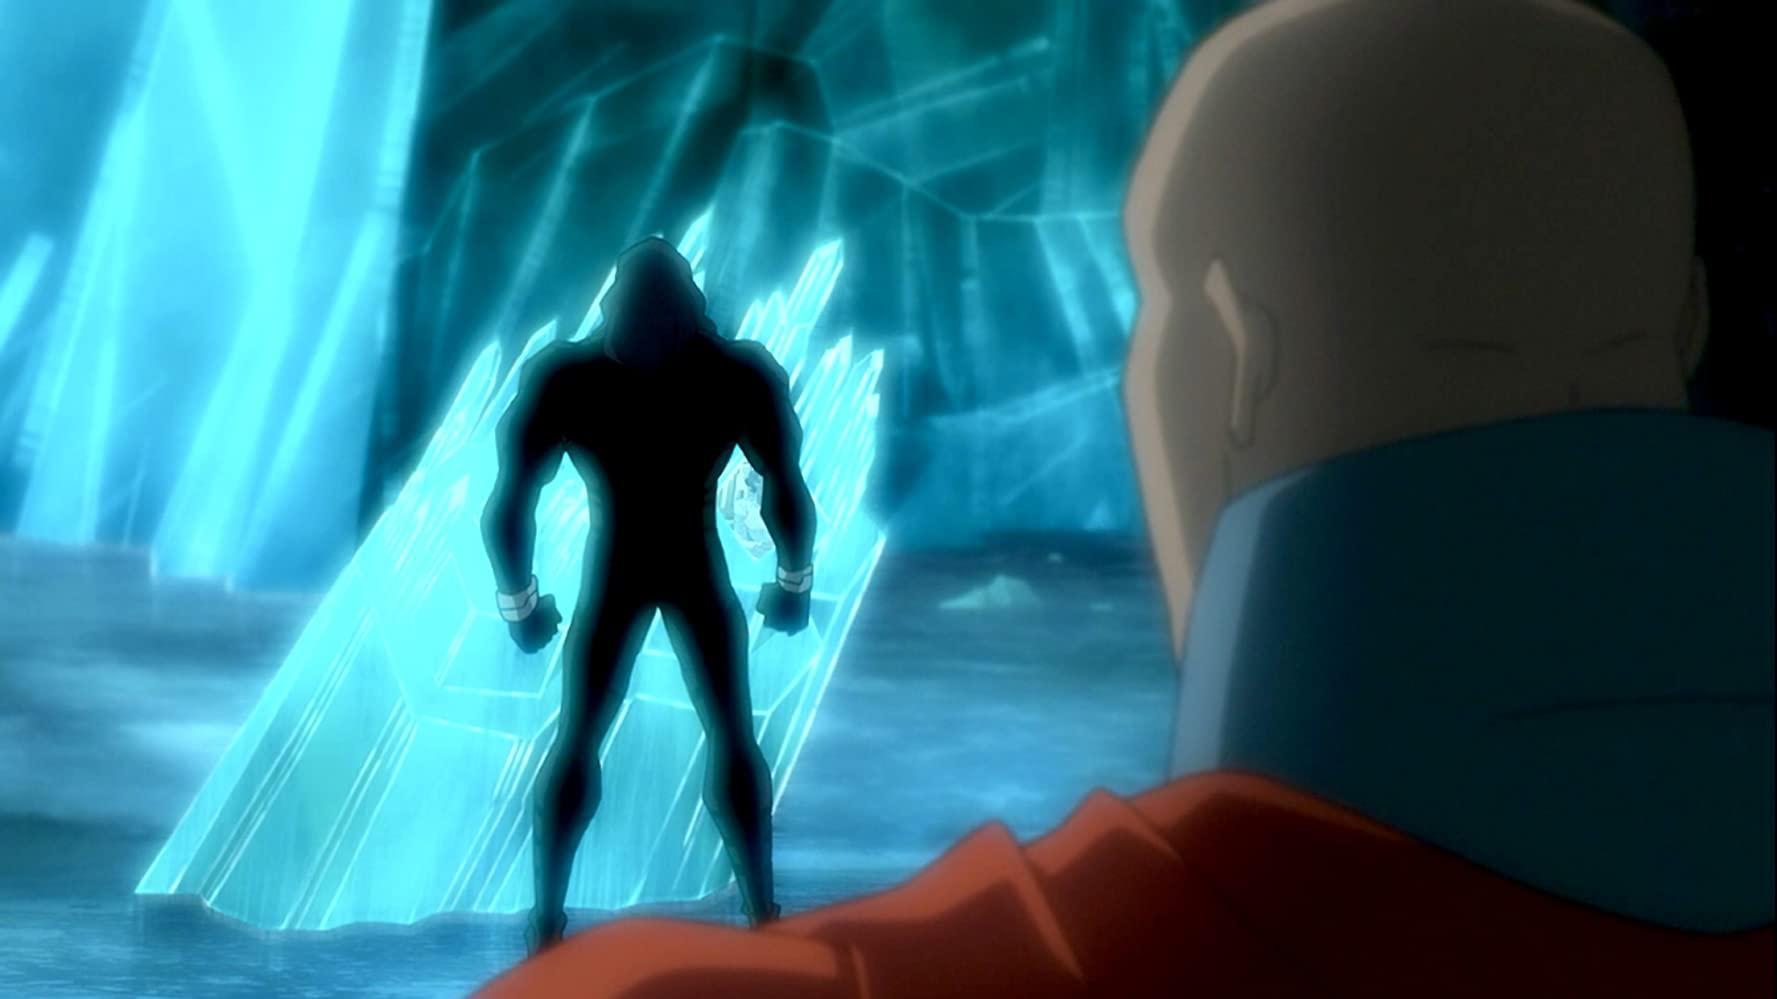 مشاهدة فيلم The Death and Return of Superman (2019) مترجم HD اون لاين